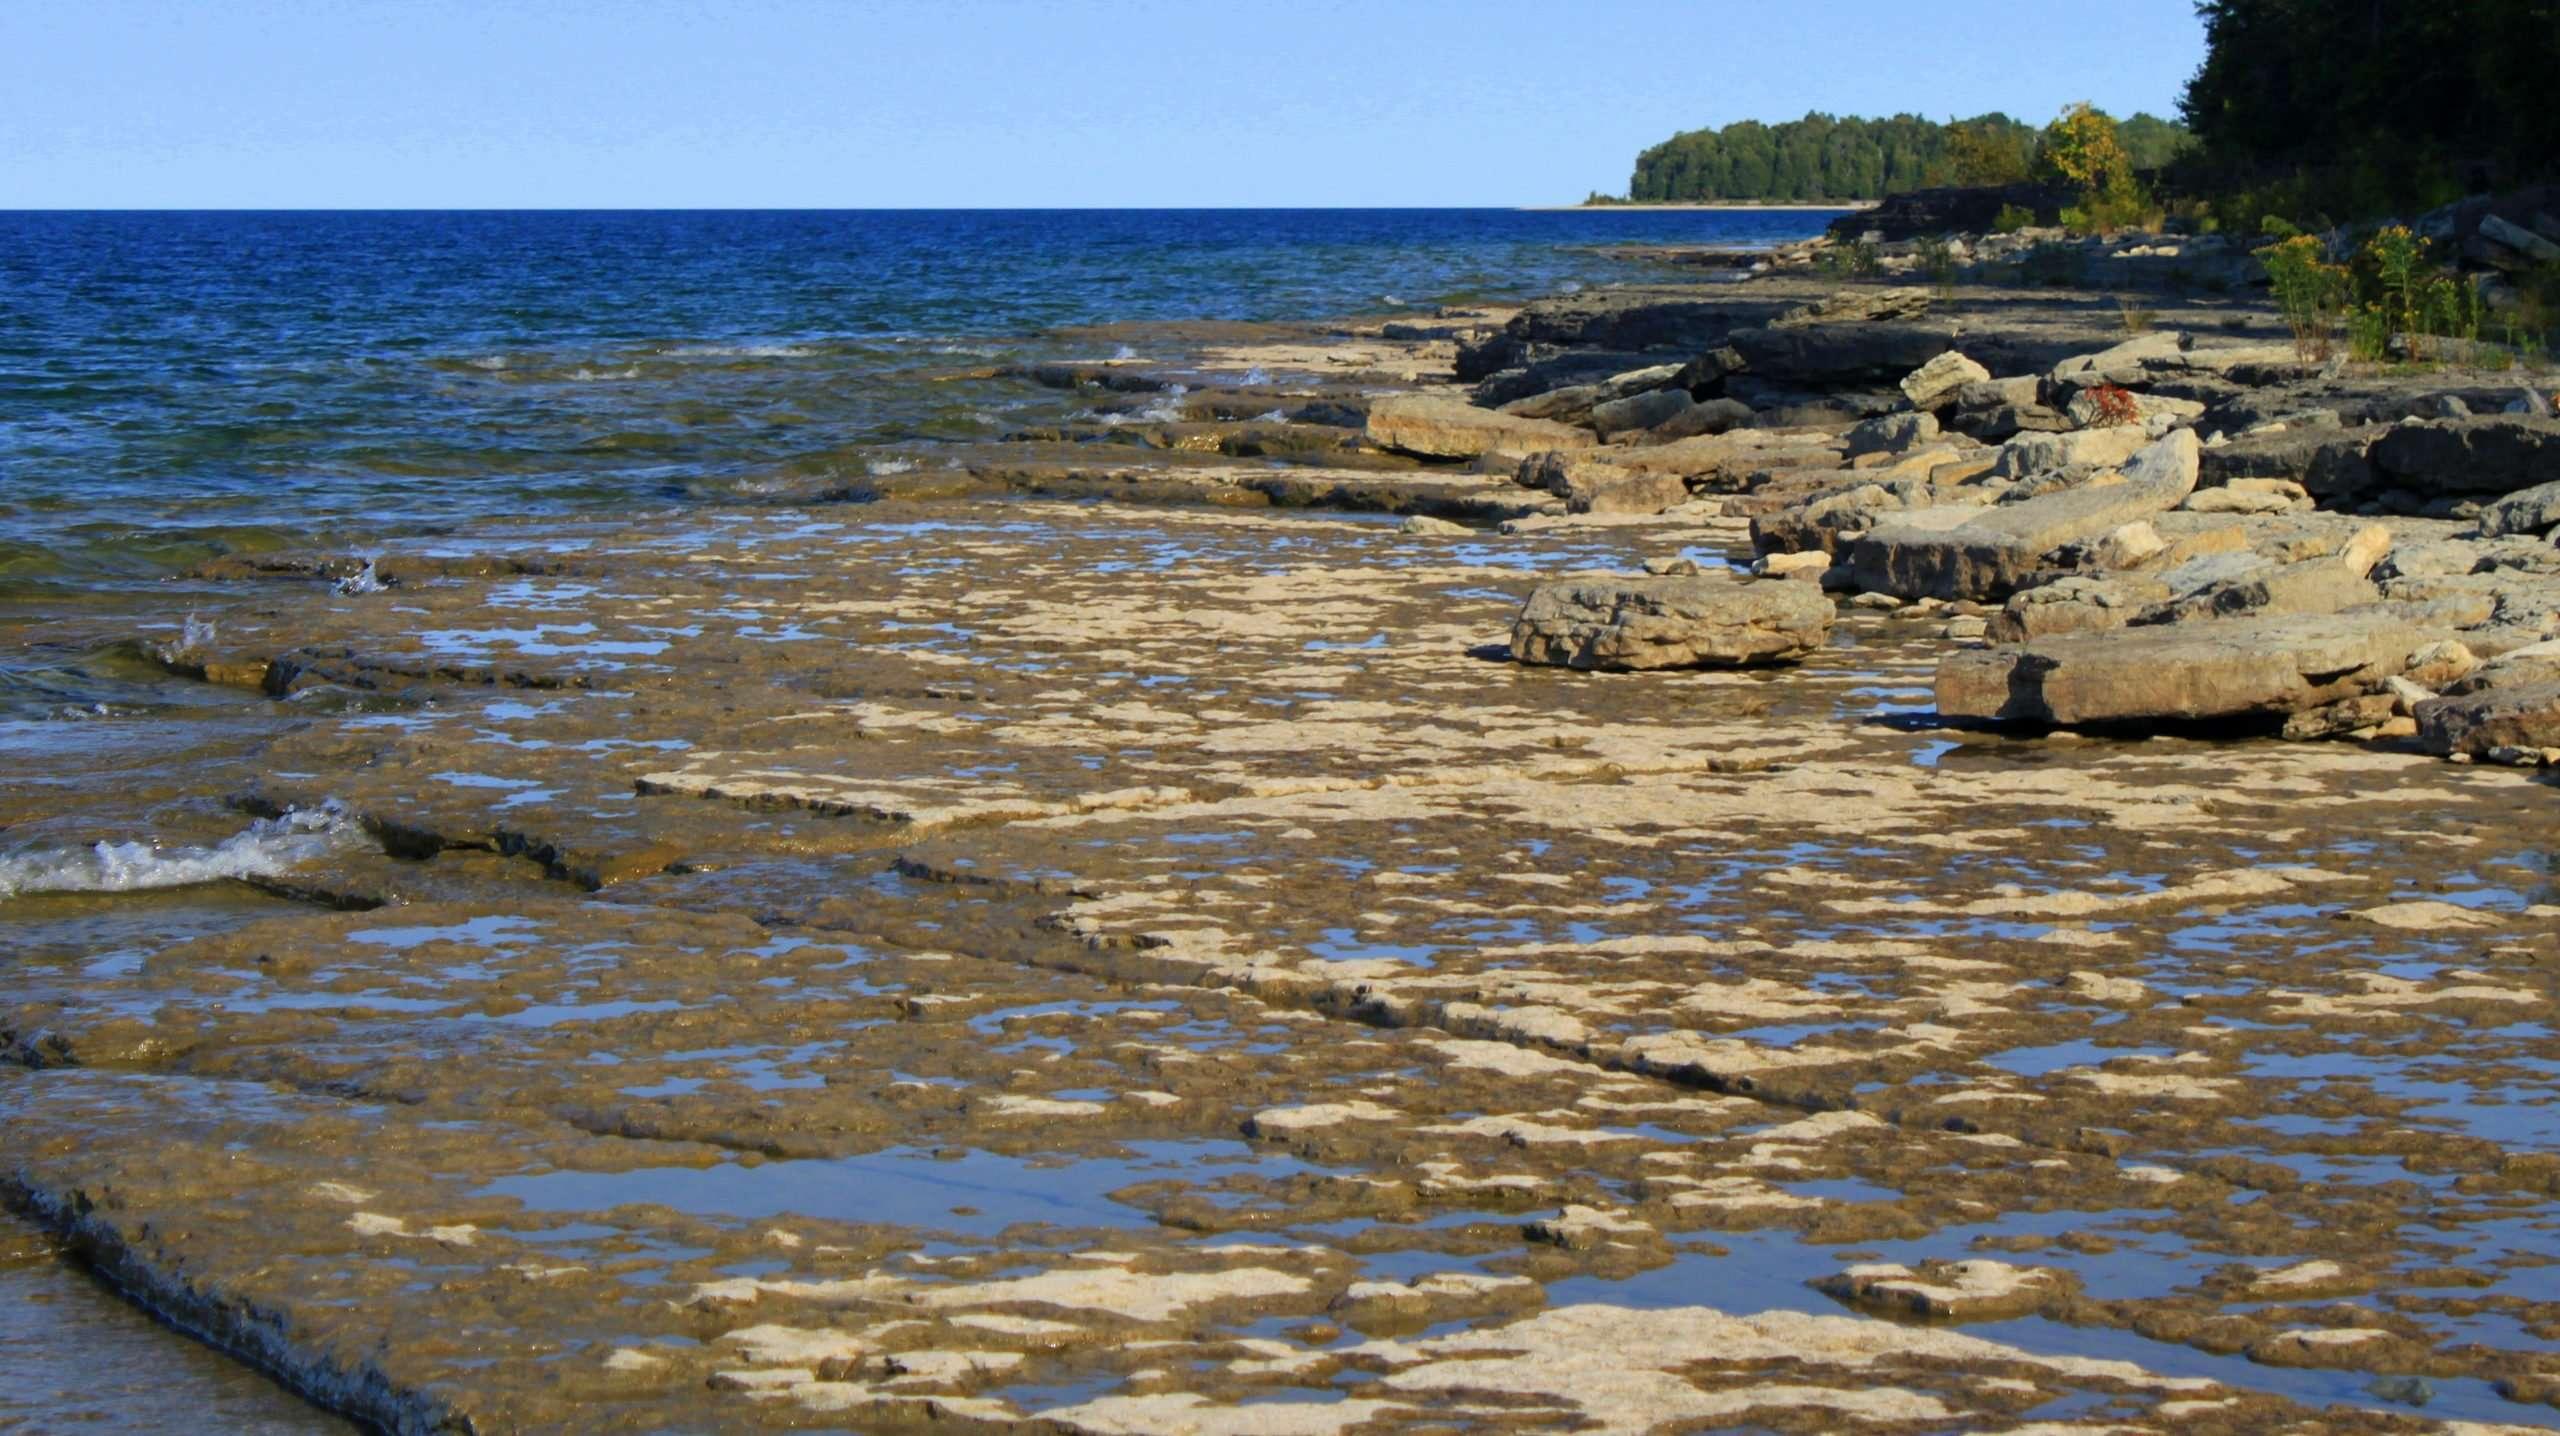 Fossil Ledges